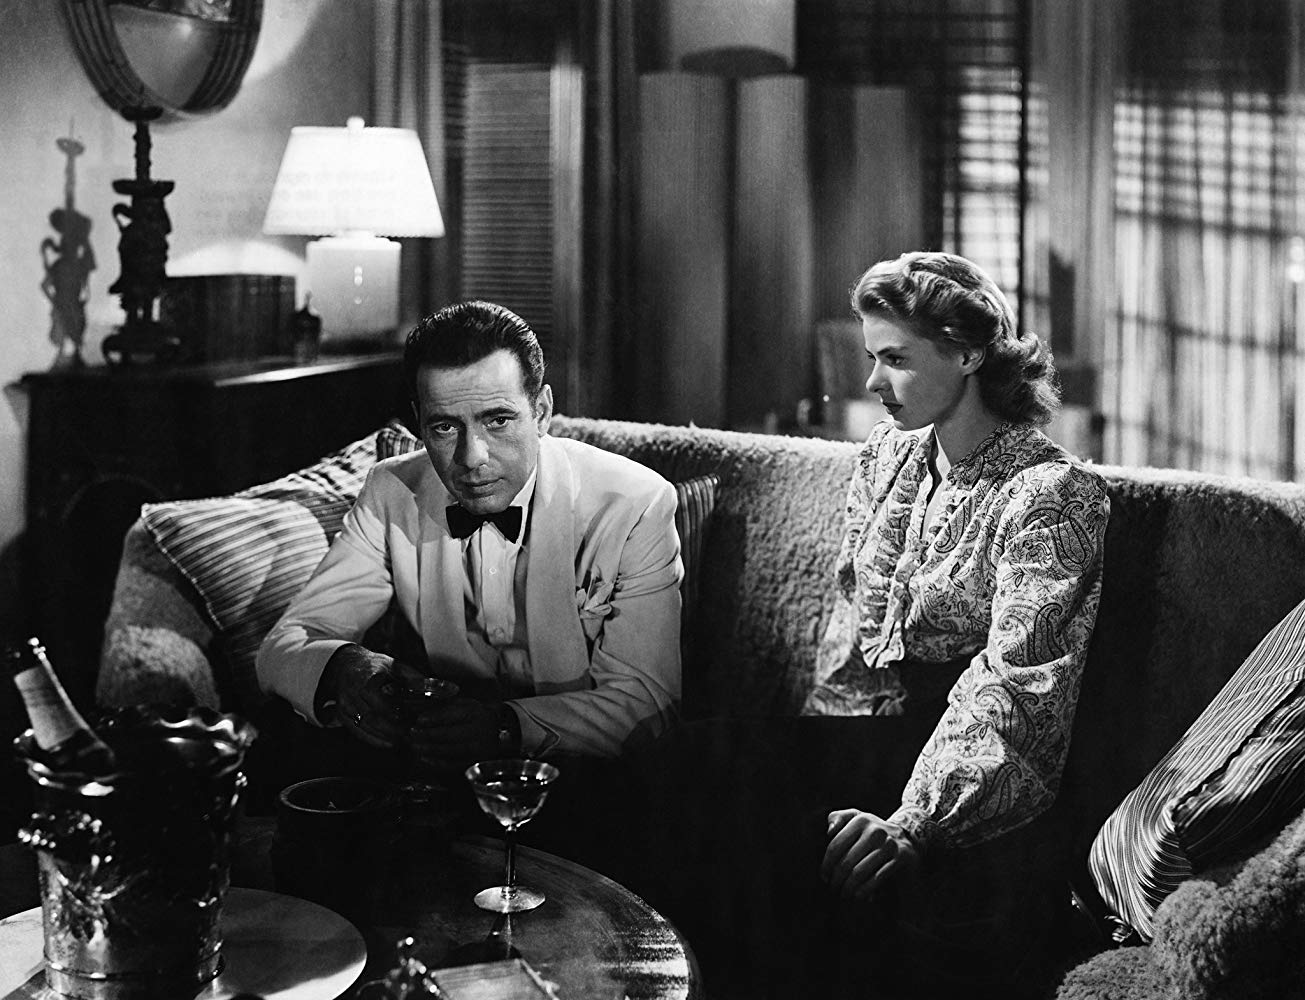 CASABLANCA - 10 فیلم برتر سیاه و سفید کلاسیک تاریخ سینما